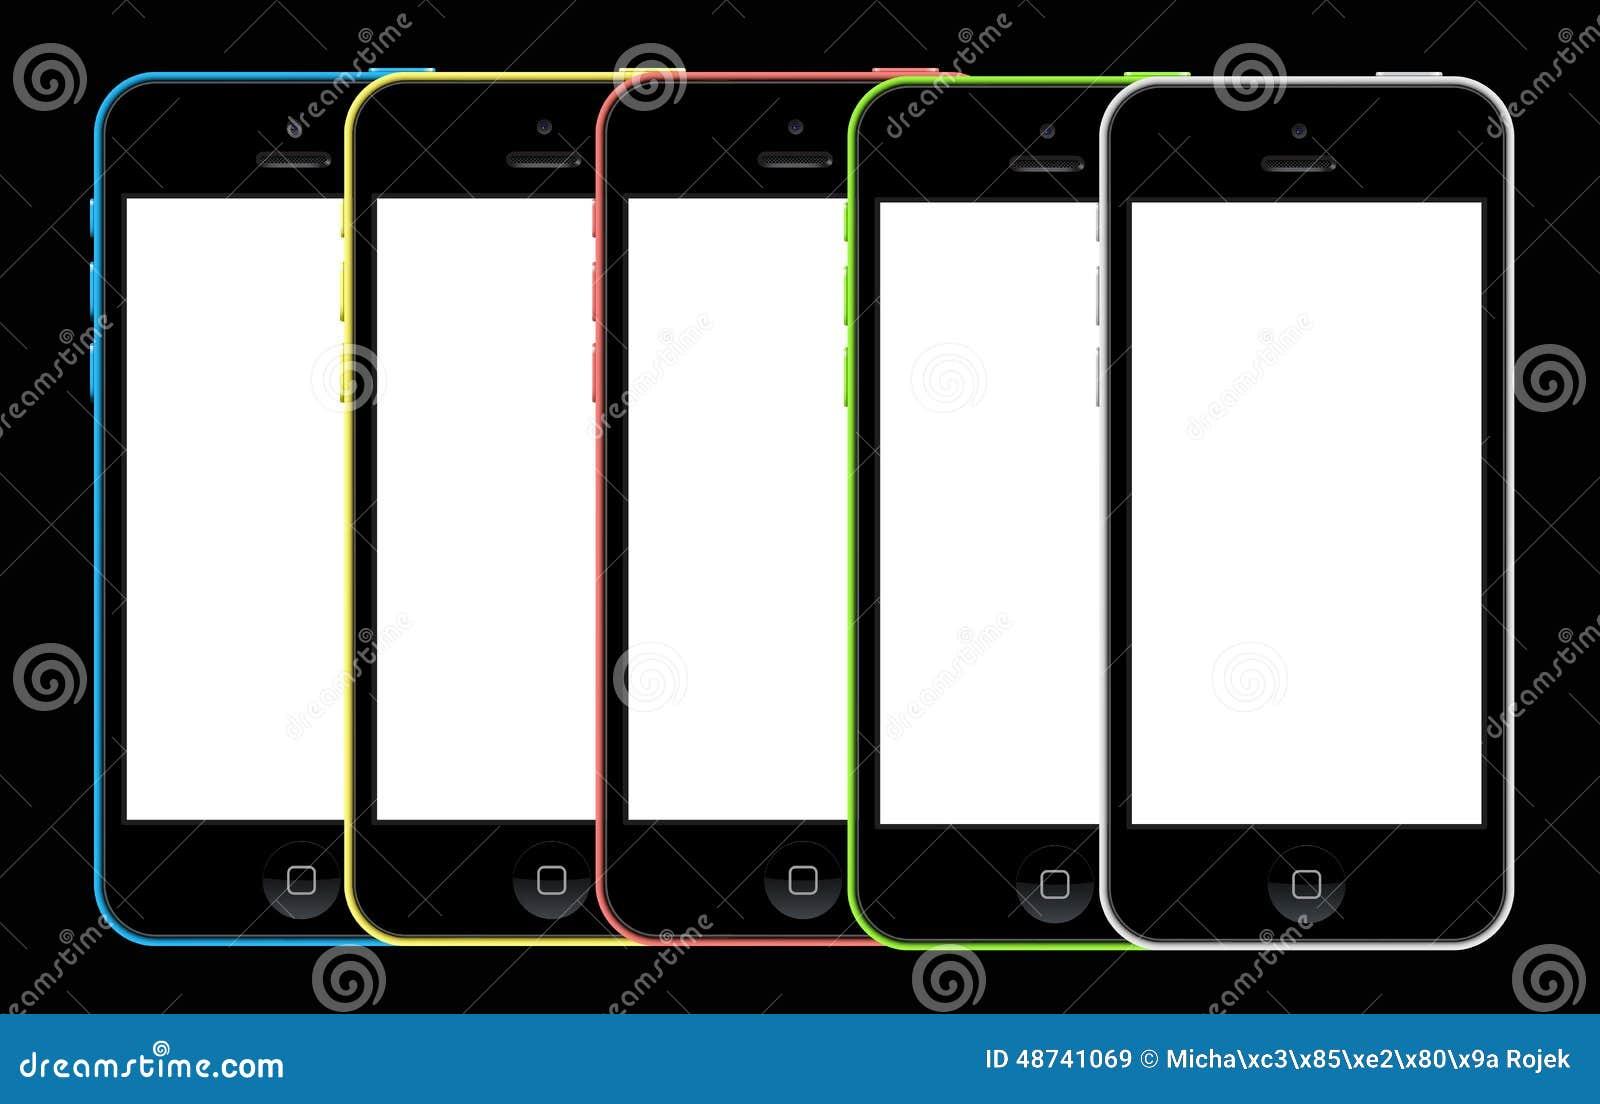 Sistema del iPhone 5c